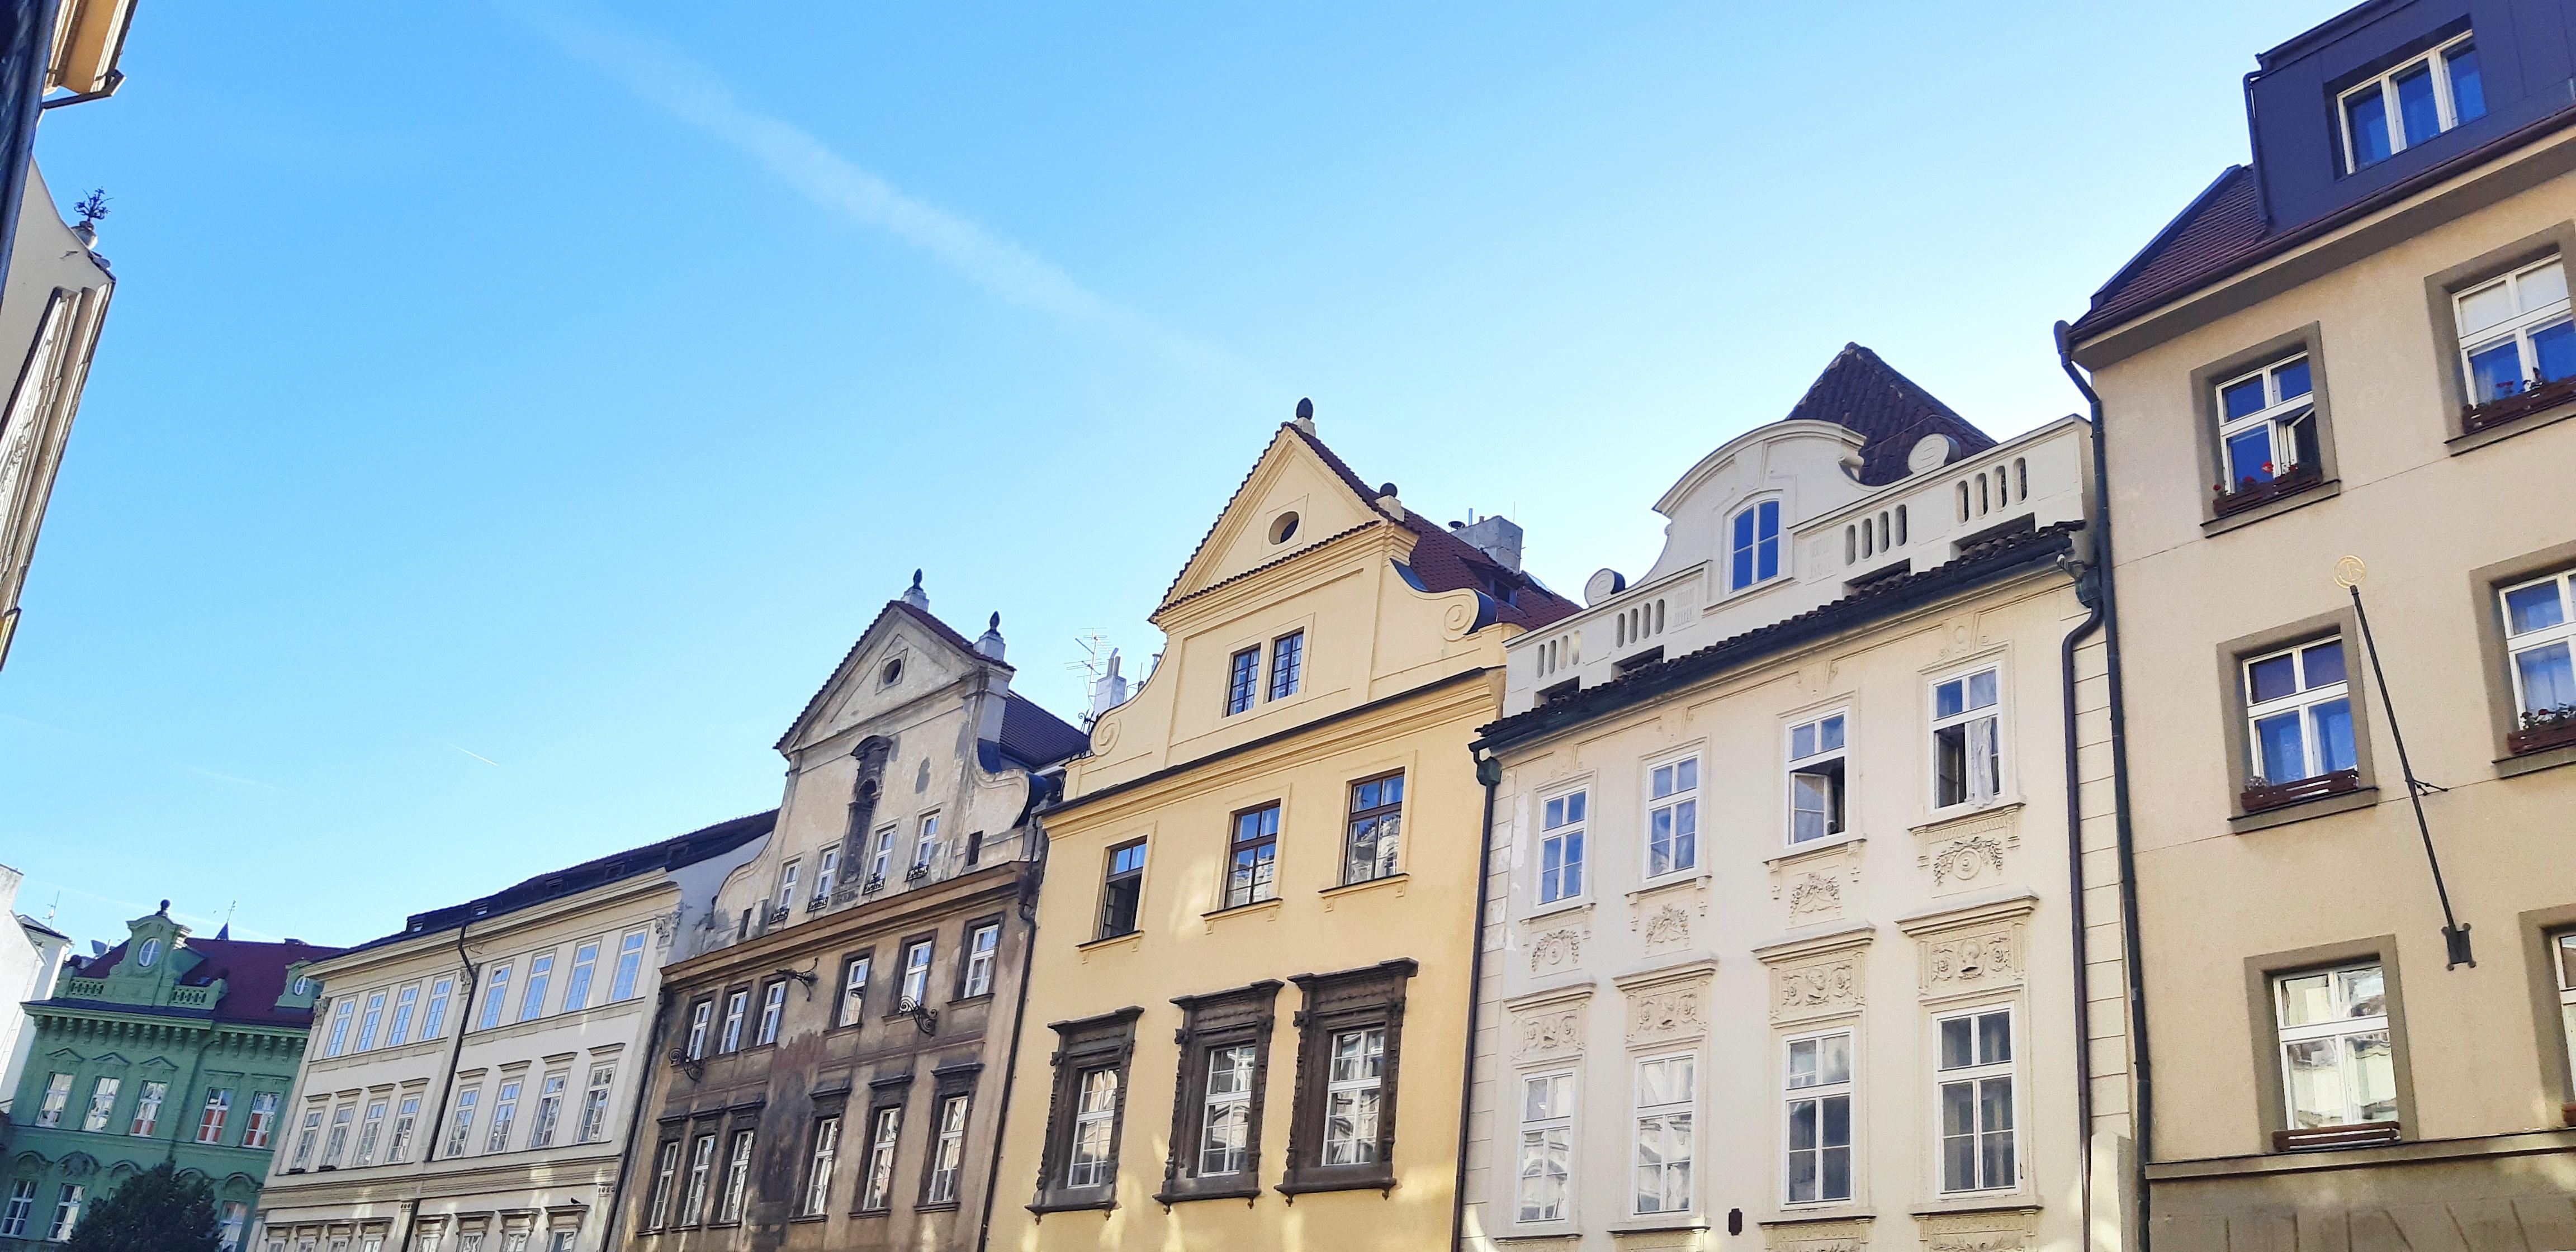 Praga architettura